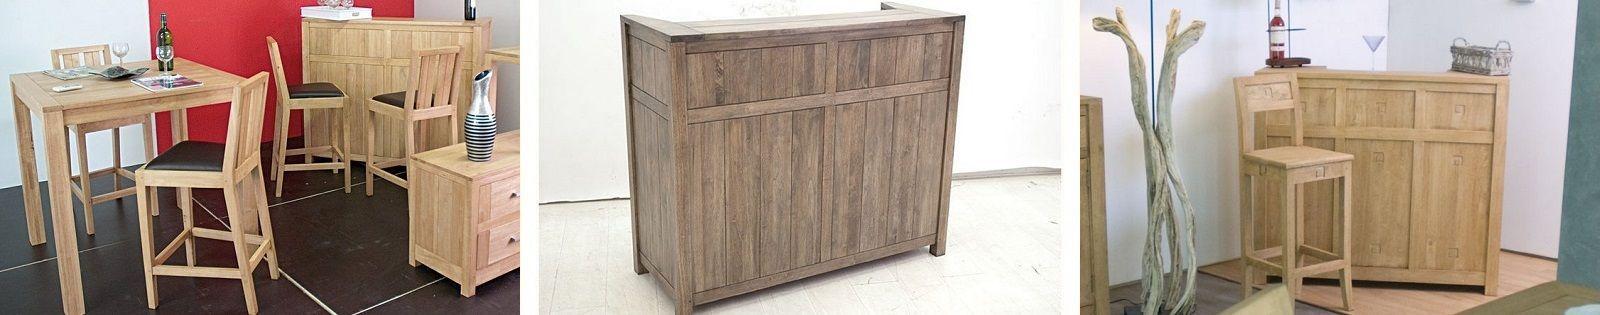 Bar en Hévéa massif : Meubles haut de gamme de fabrication artisanale